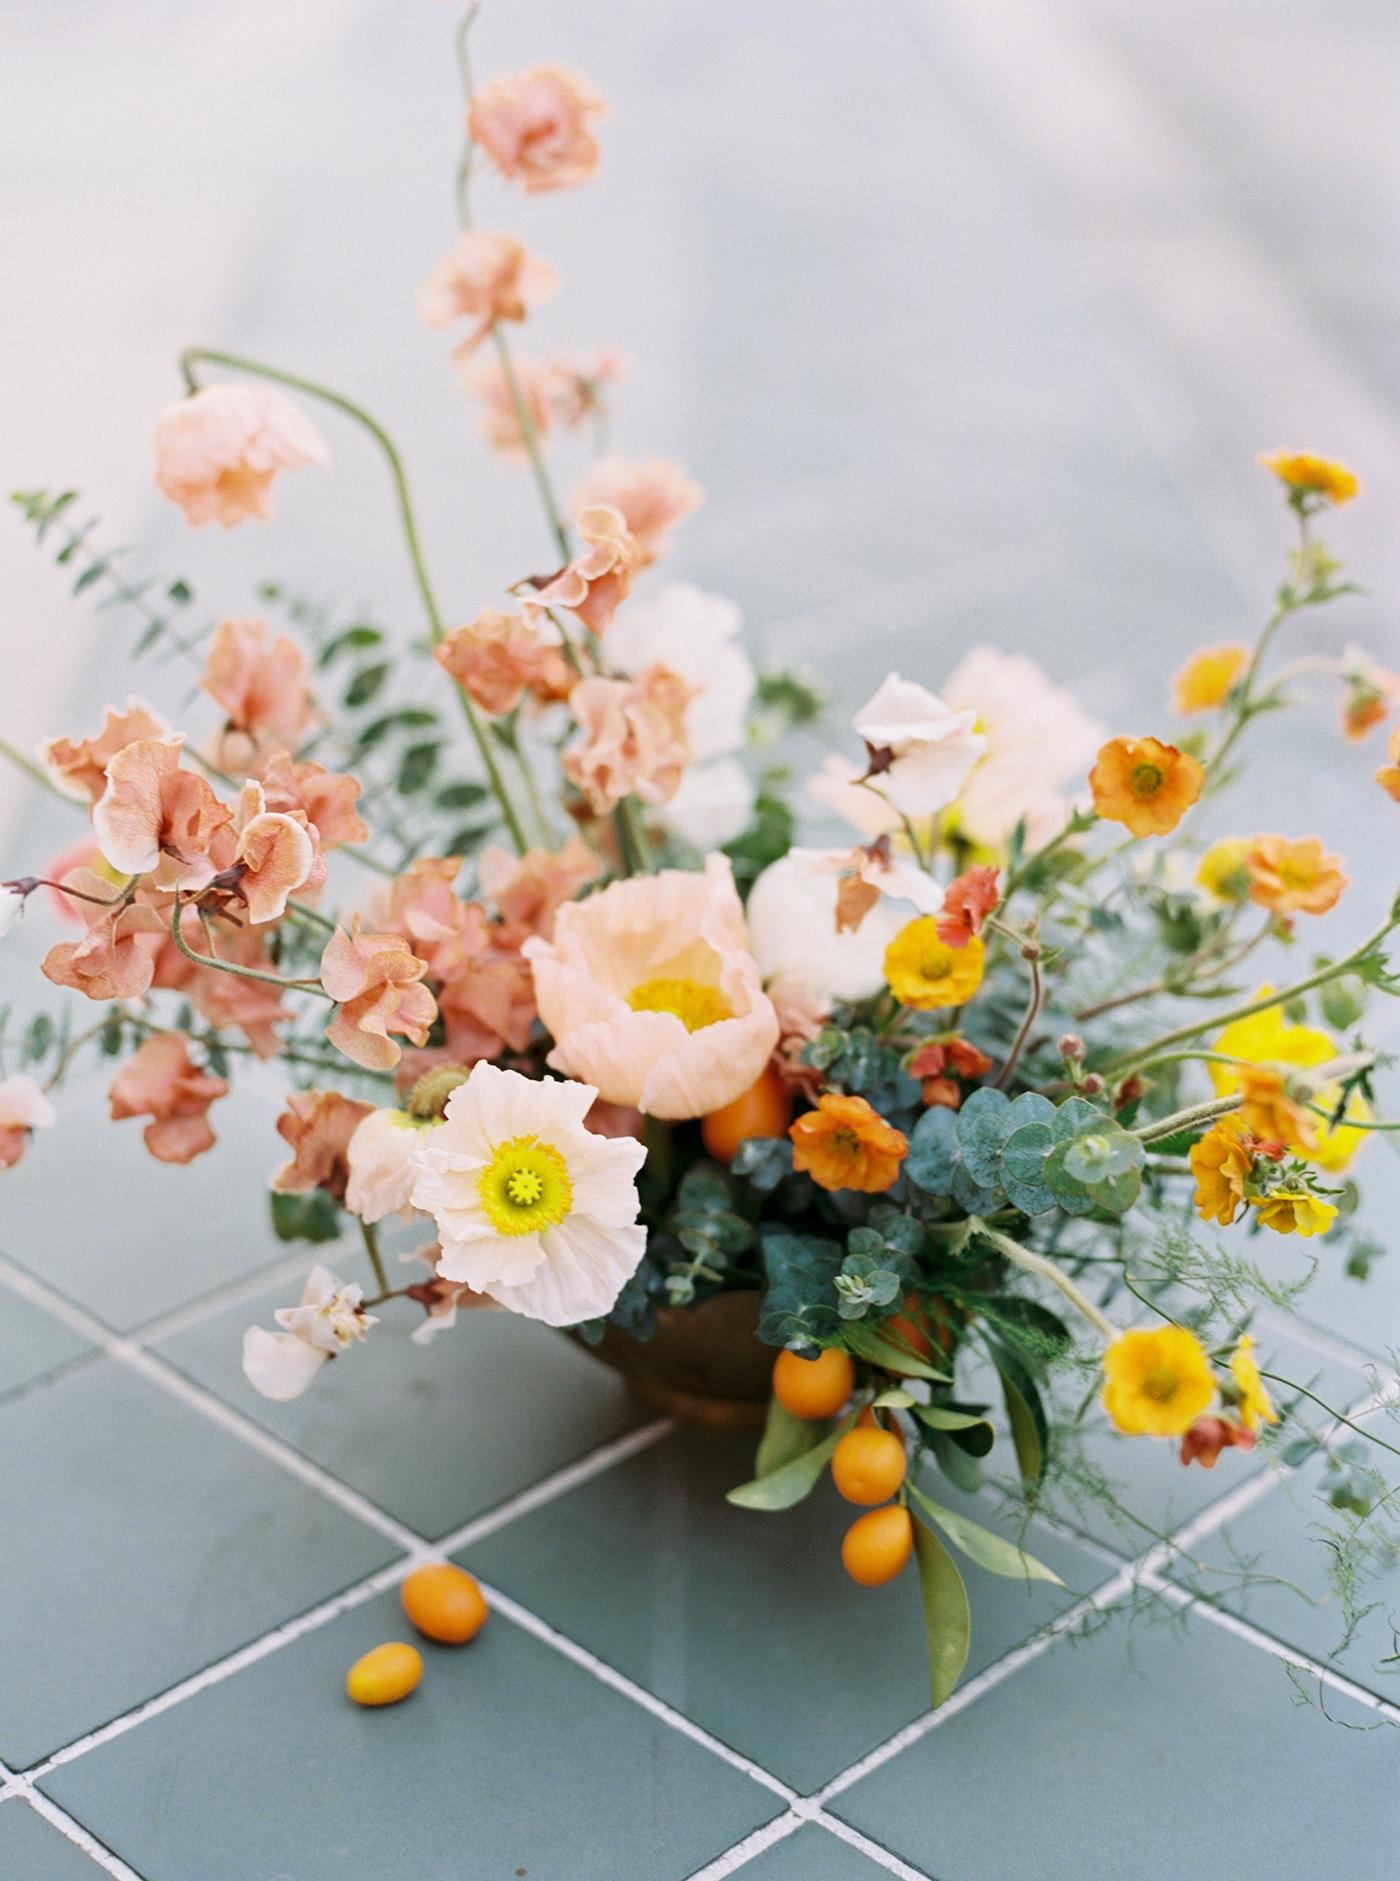 Fine Art Wedding Florist - Dallas, Texas - Olive Grove Design - 00063.jpg